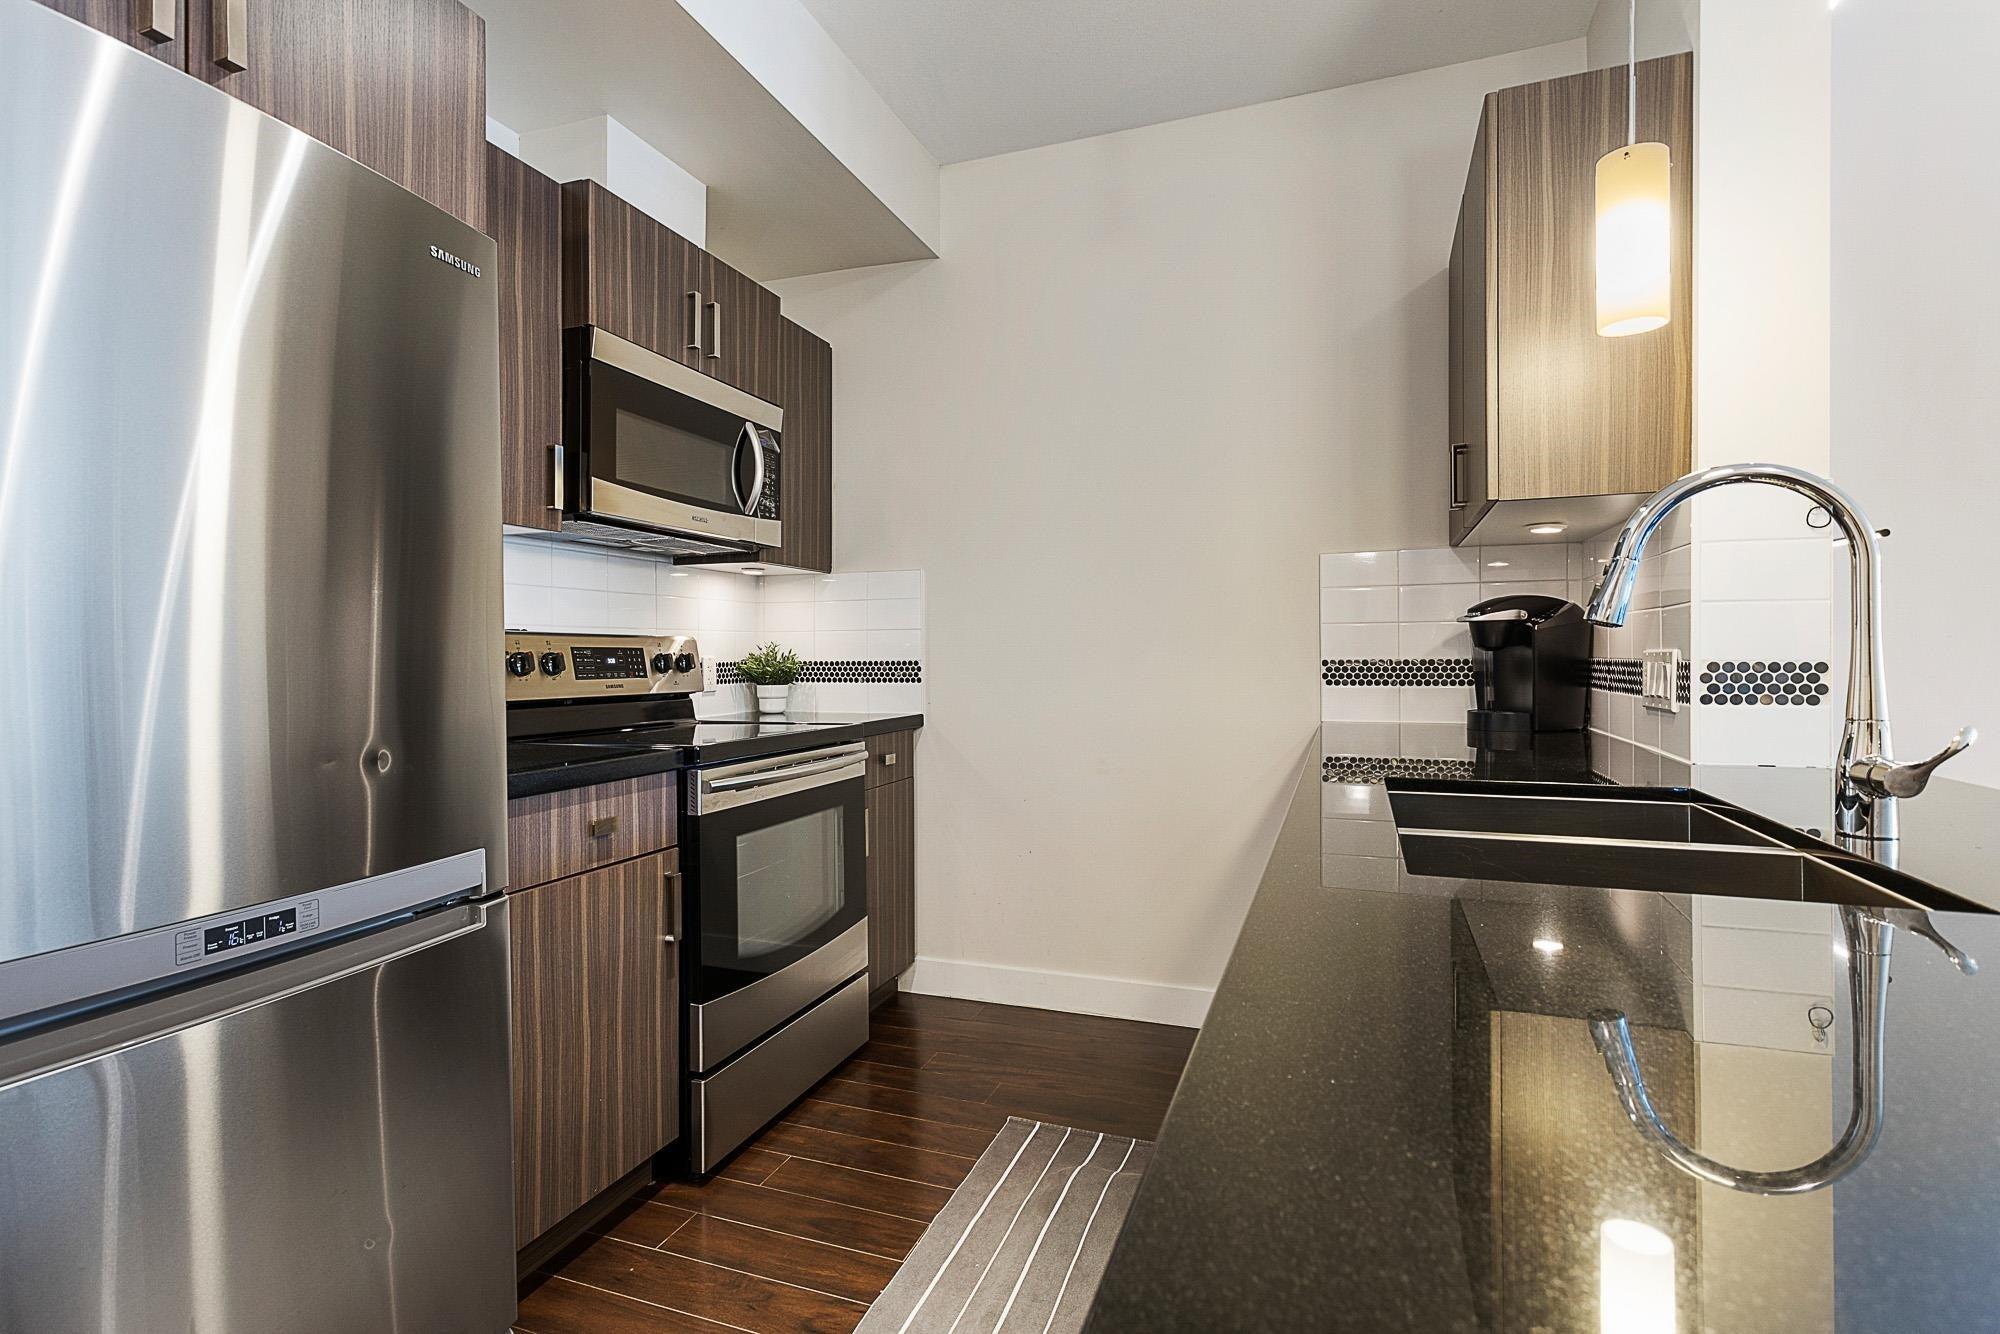 114 20219 54A AVENUE - Langley City Apartment/Condo for sale, 1 Bedroom (R2616172) - #3